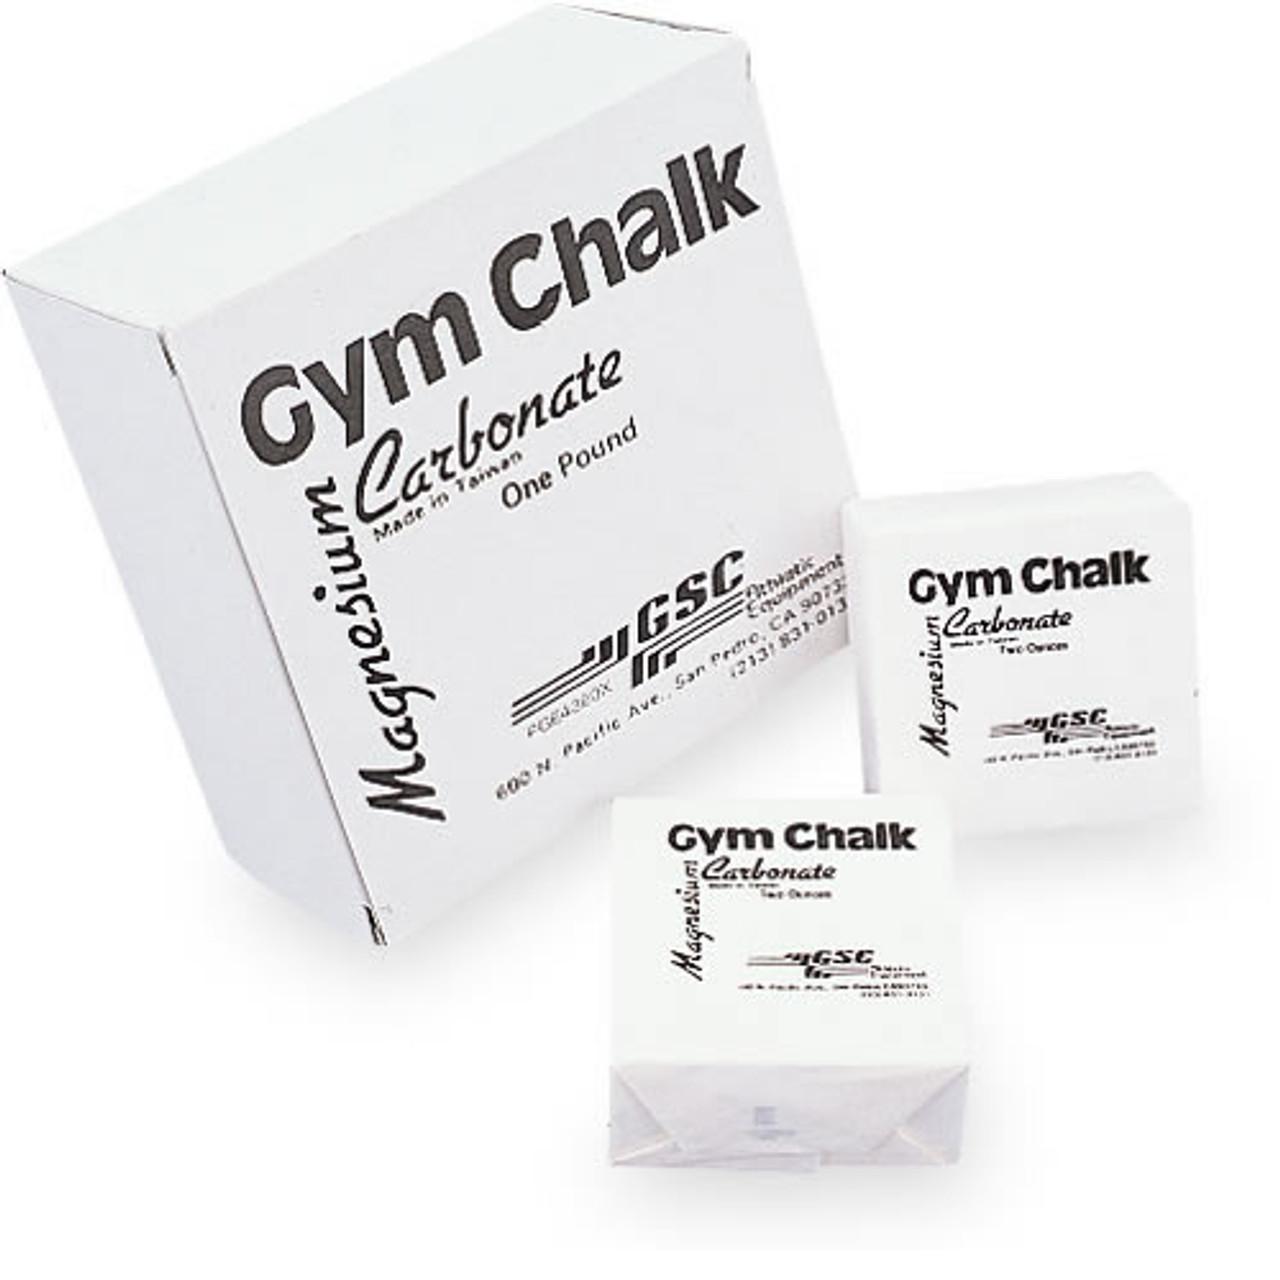 BSN Sports Gym Chalk (8-Pack)